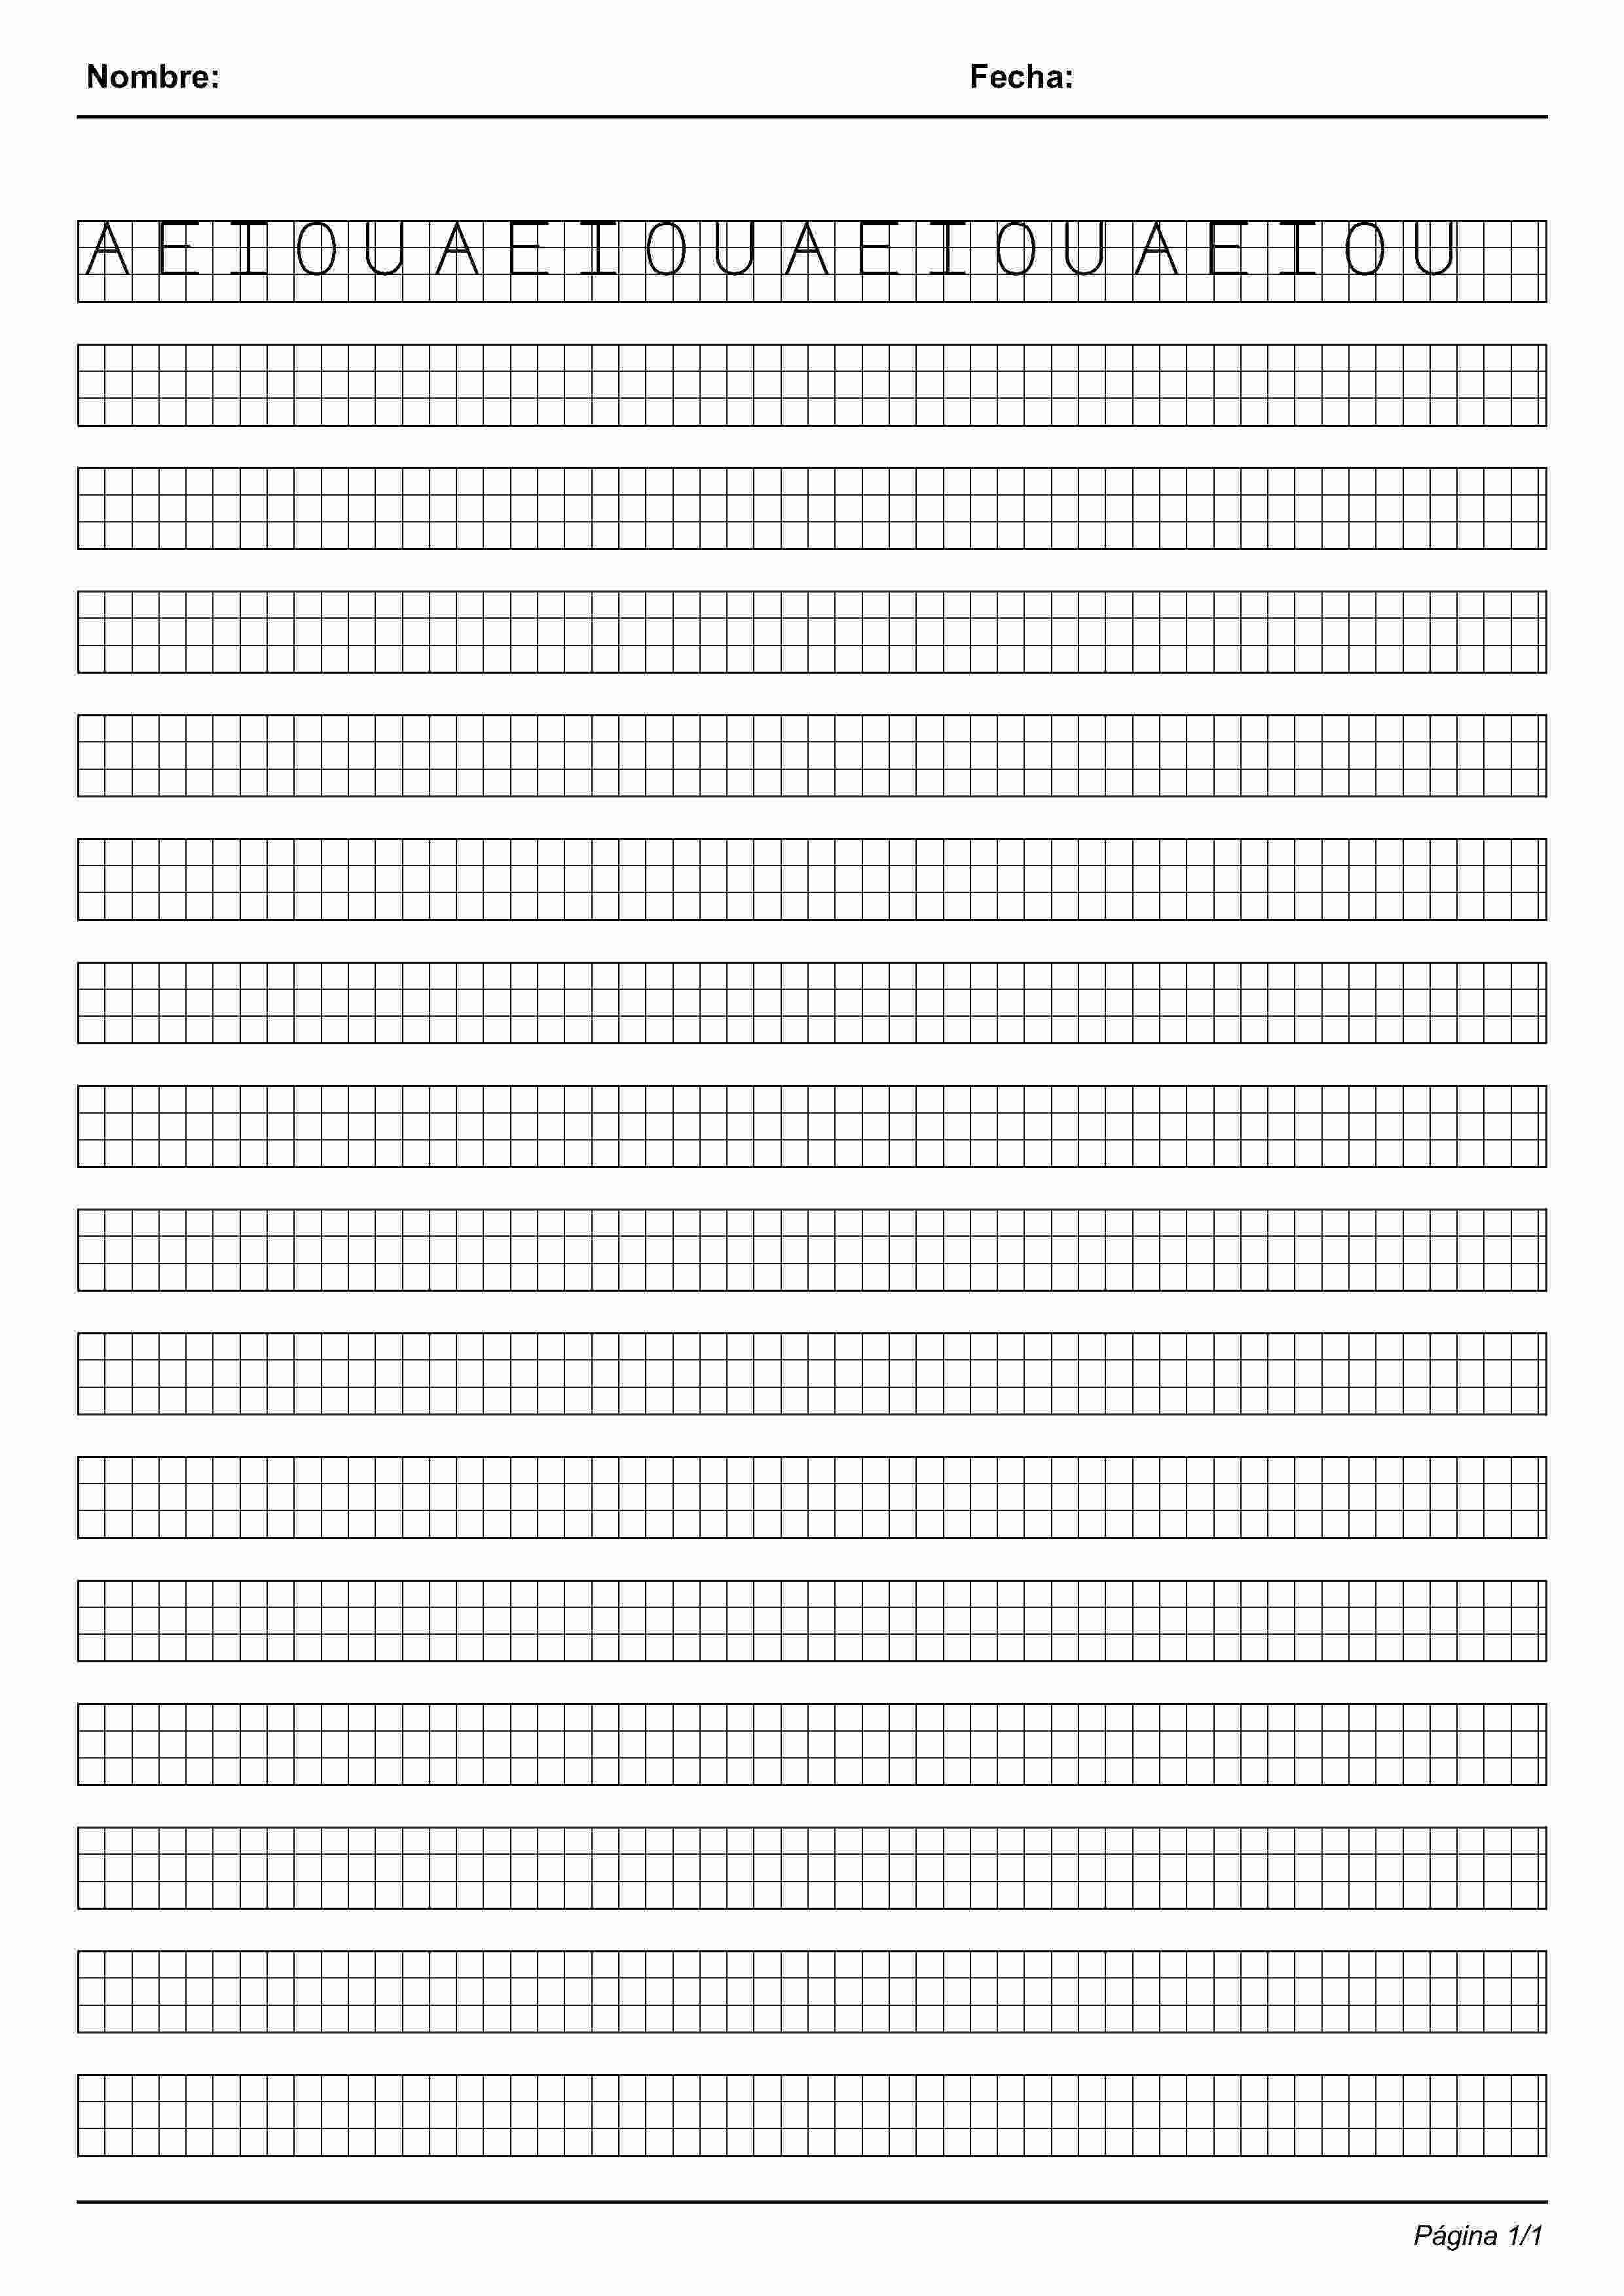 Hoja De Calendario Noviembre 2017 Para Imprimir Más Arriba-a-fecha Actividades Para Ni±os Preescolar Primaria E Inicial Imprimir Of Hoja De Calendario Noviembre 2017 Para Imprimir Más Actual Primer Da De Clase Actividad todo sobre Mi Diferentes Modelos